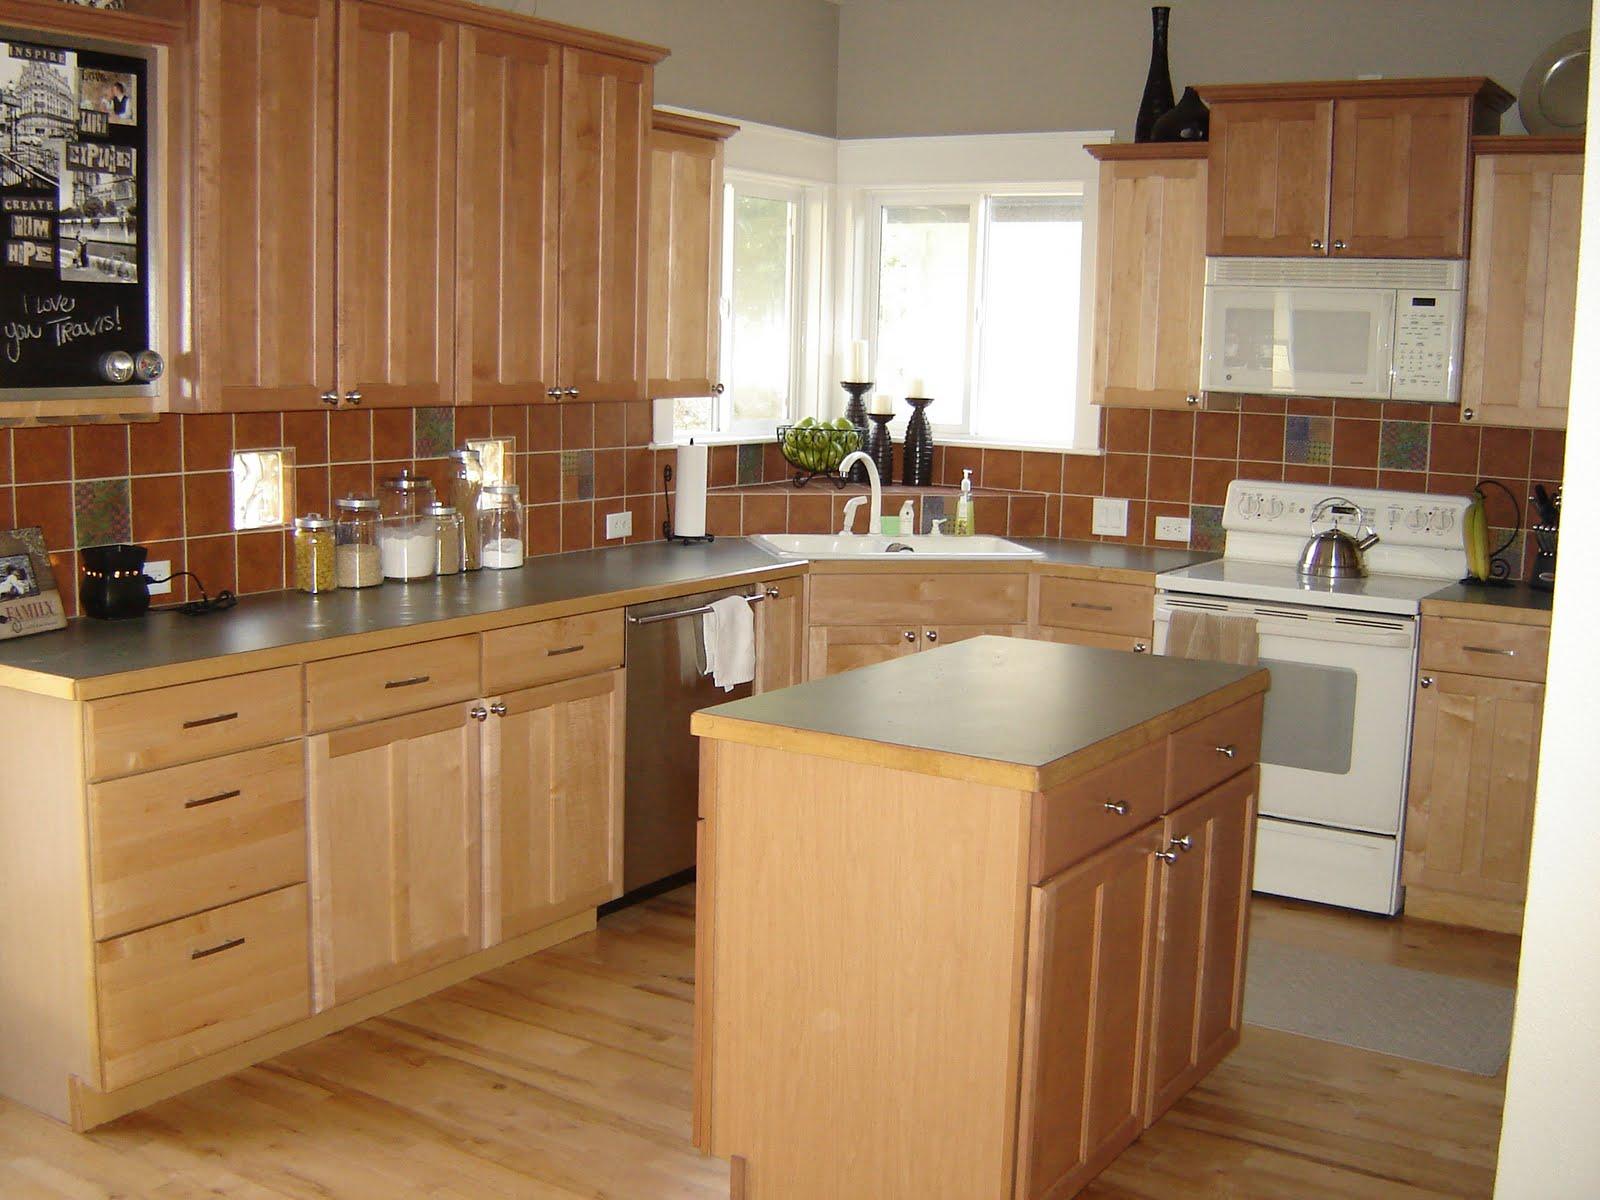 My Suite Bliss: DIY: Kitchen Island Re-do